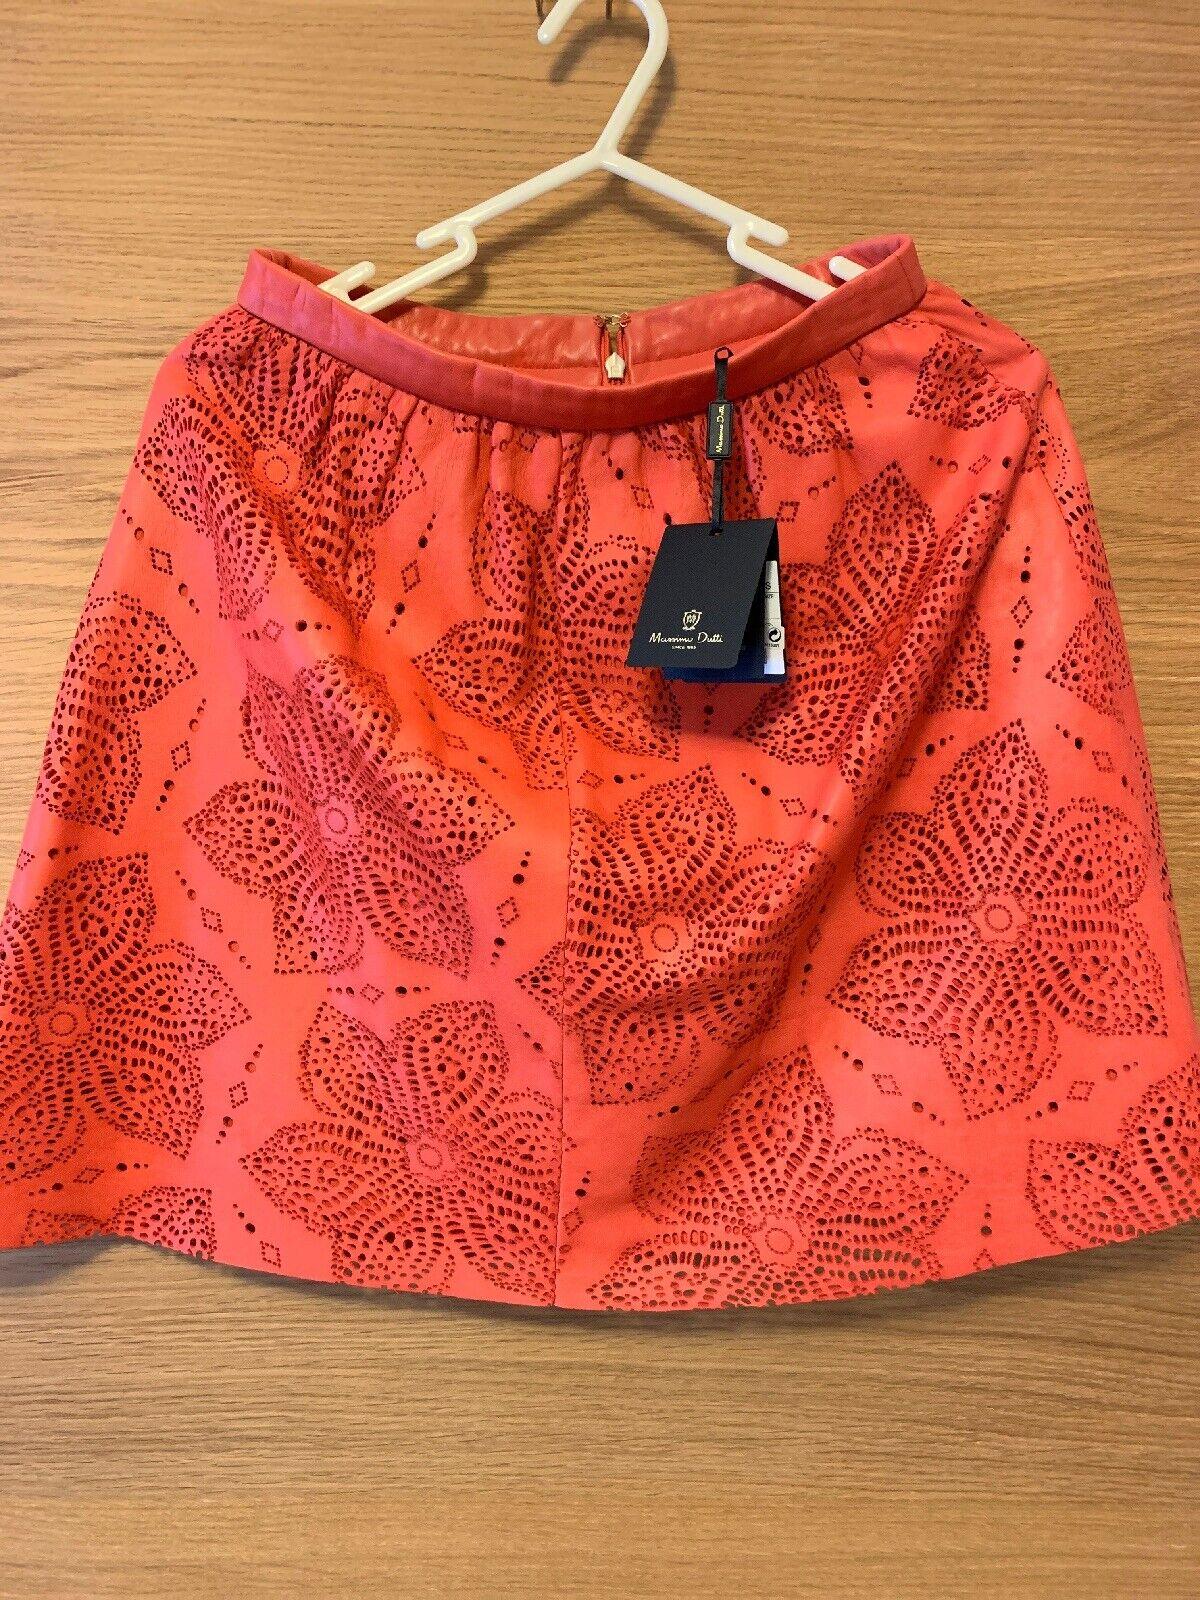 Massimo Dutti Leather Skirt UK8